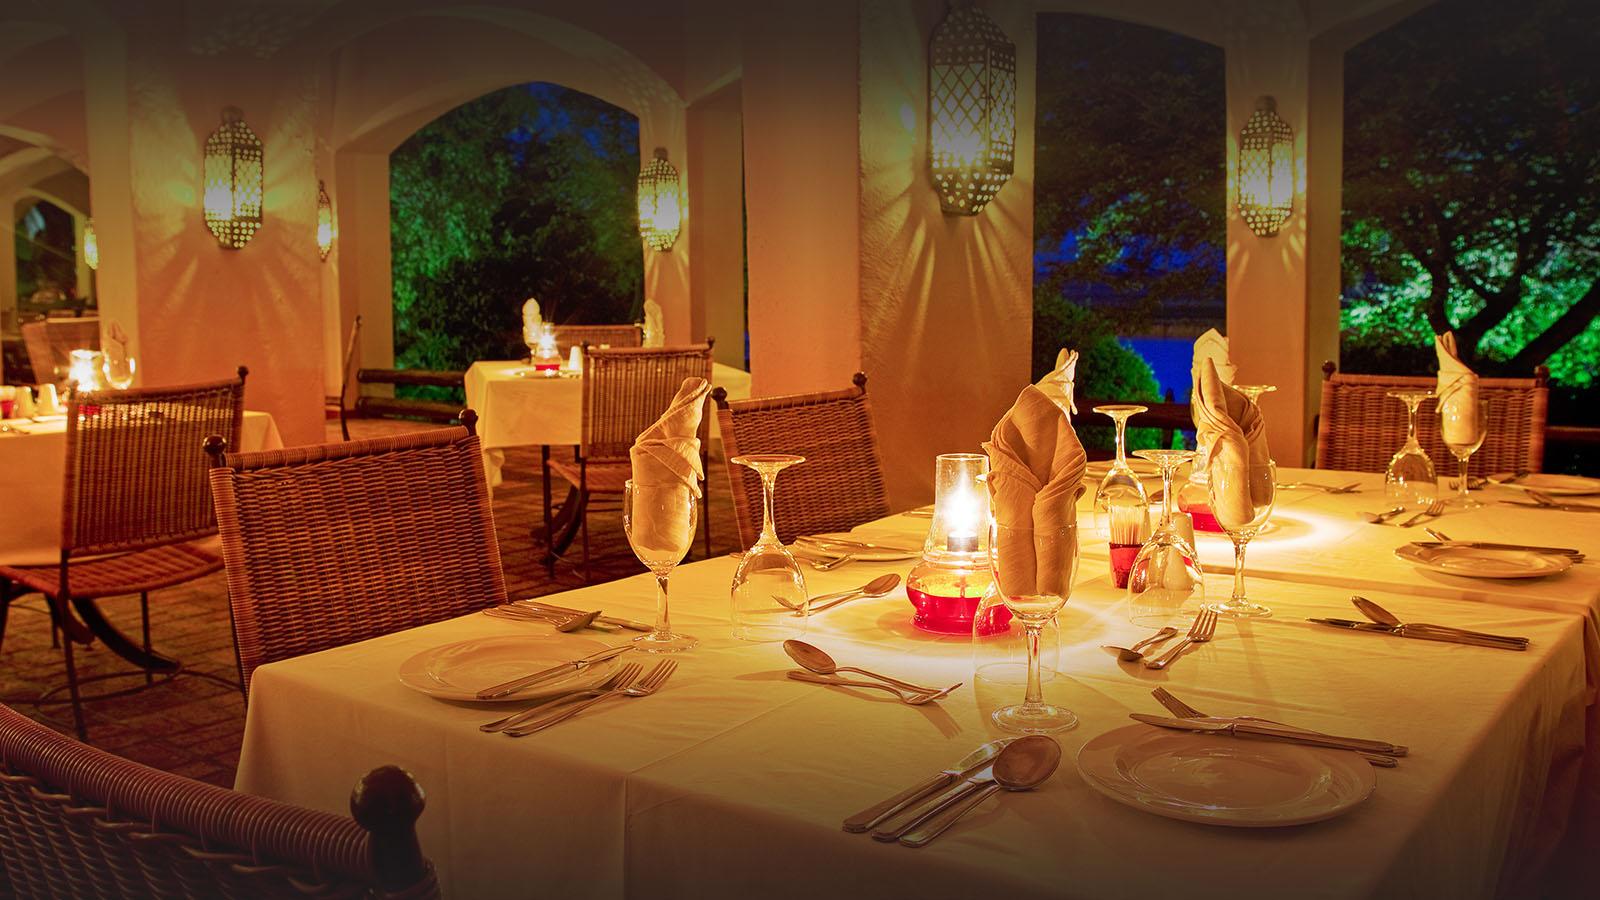 chobe game lodge botswana-lodges-chobe-national-park-accommodation-indoor-dining